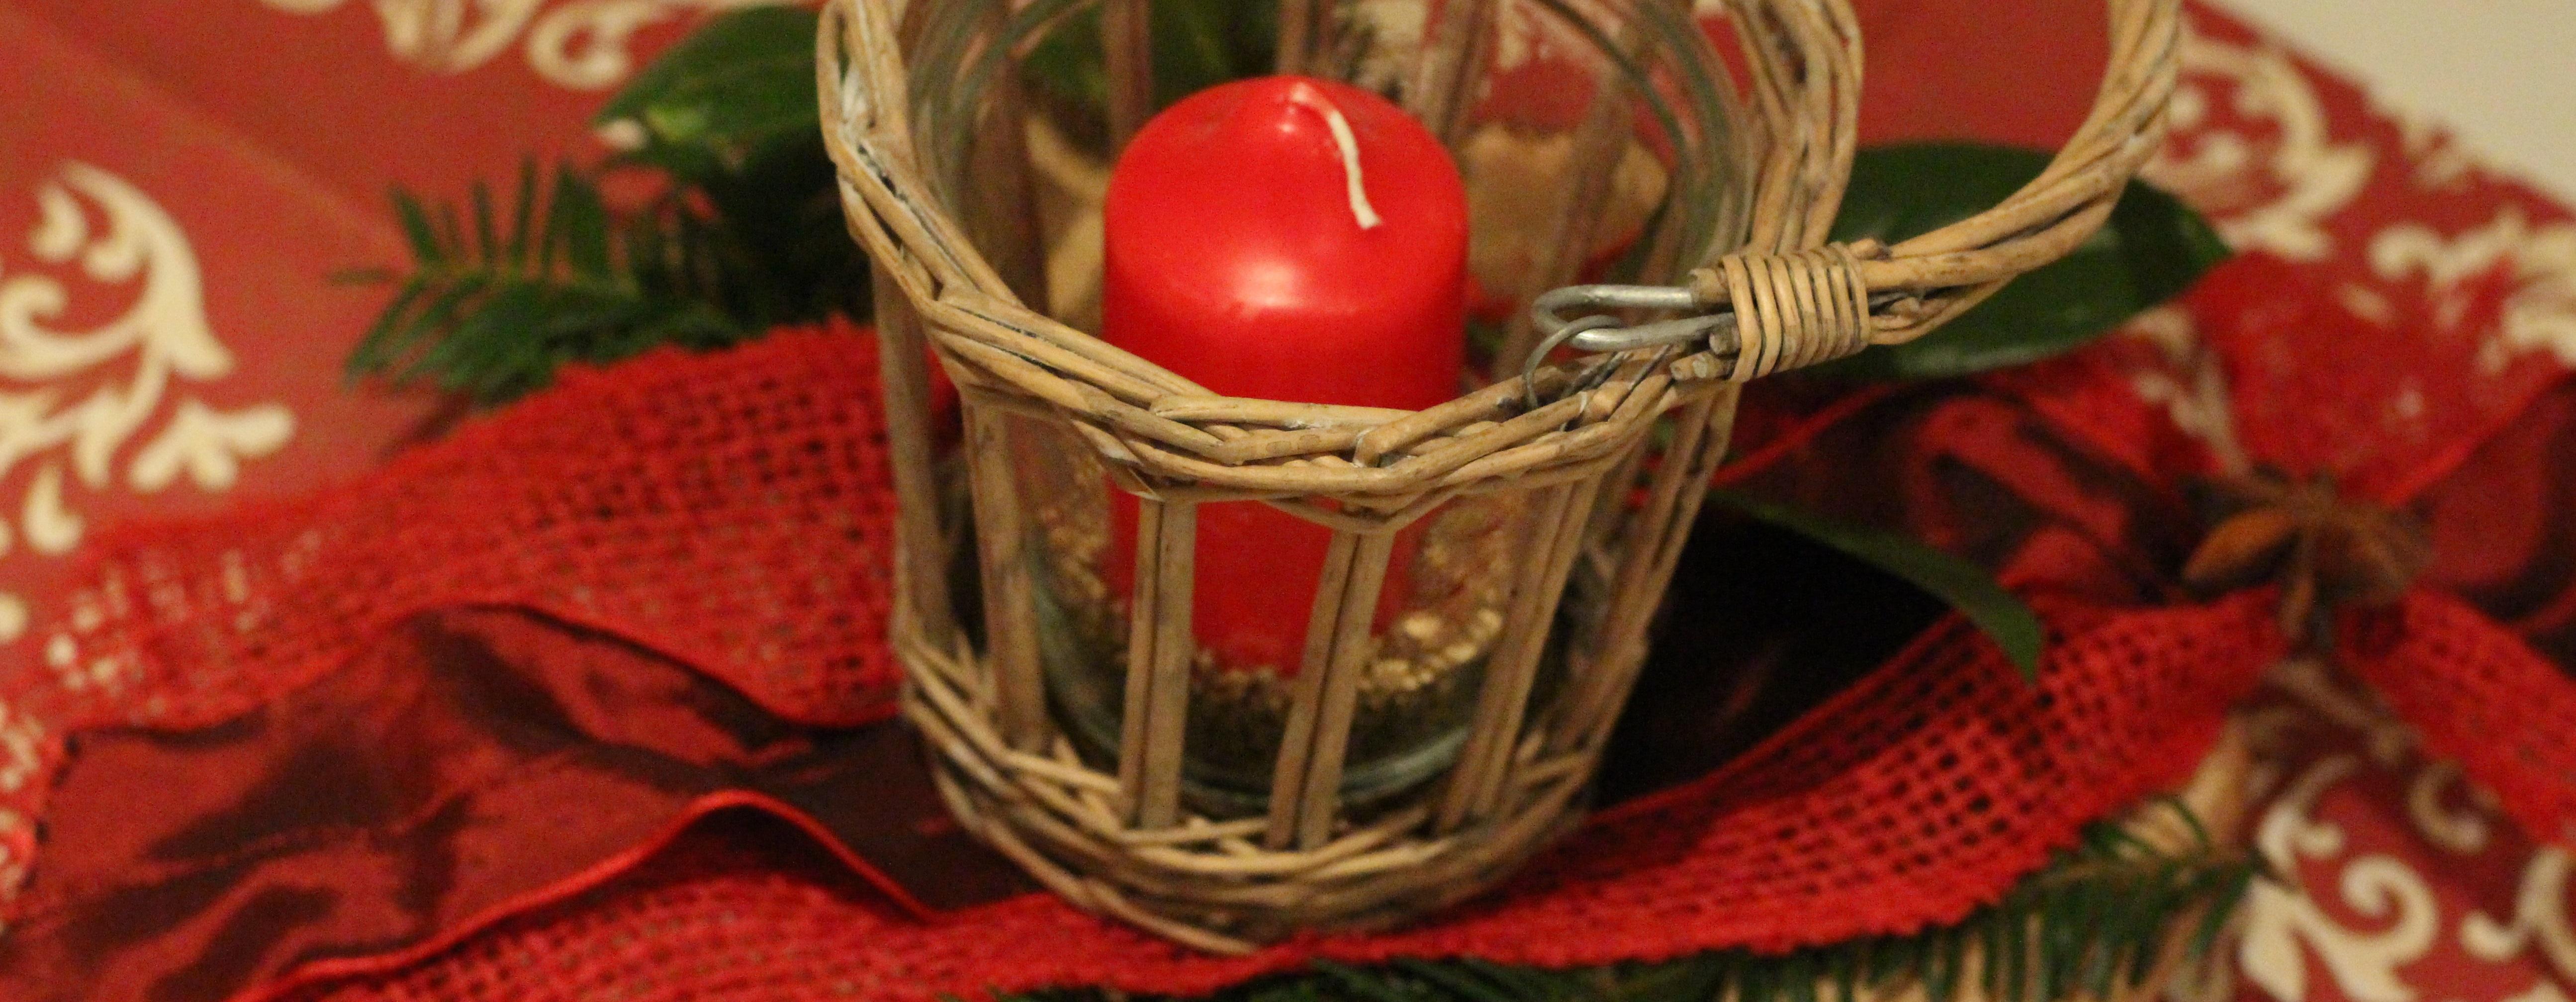 Read more about the article Predigten an Weihnachten